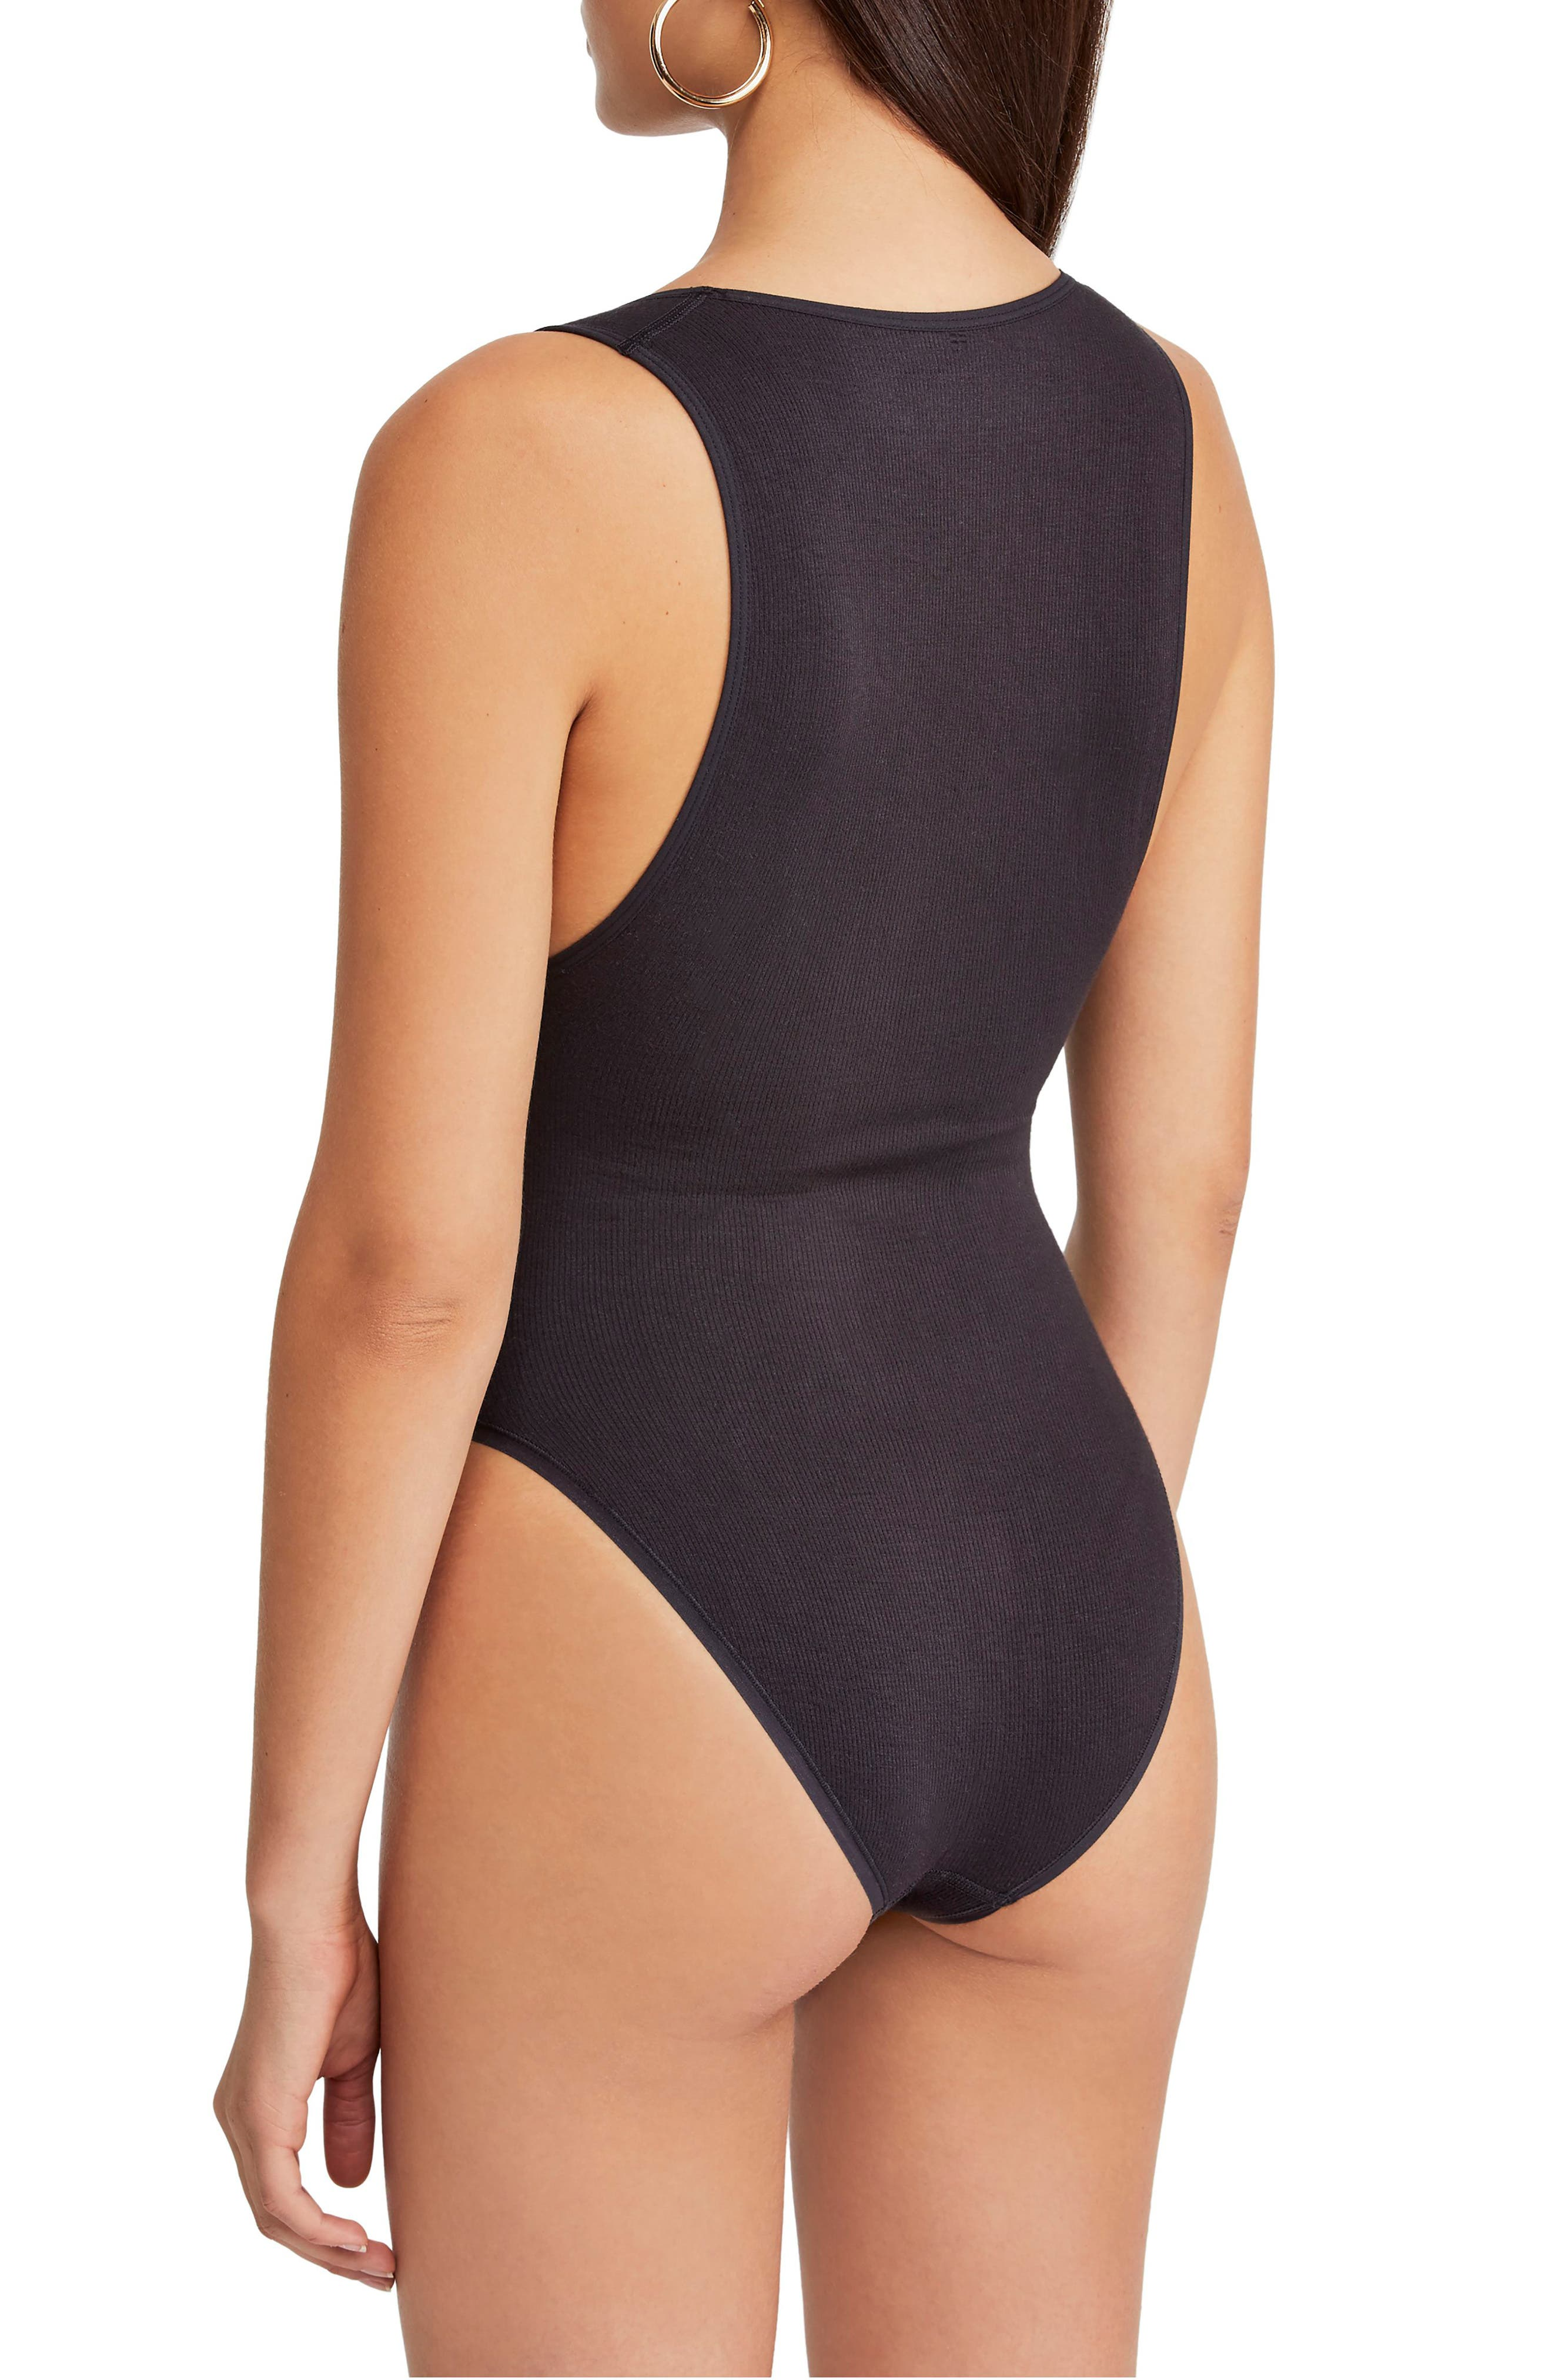 Urban Outfitters Seamless Bodysuit,                             Alternate thumbnail 3, color,                             BLACK